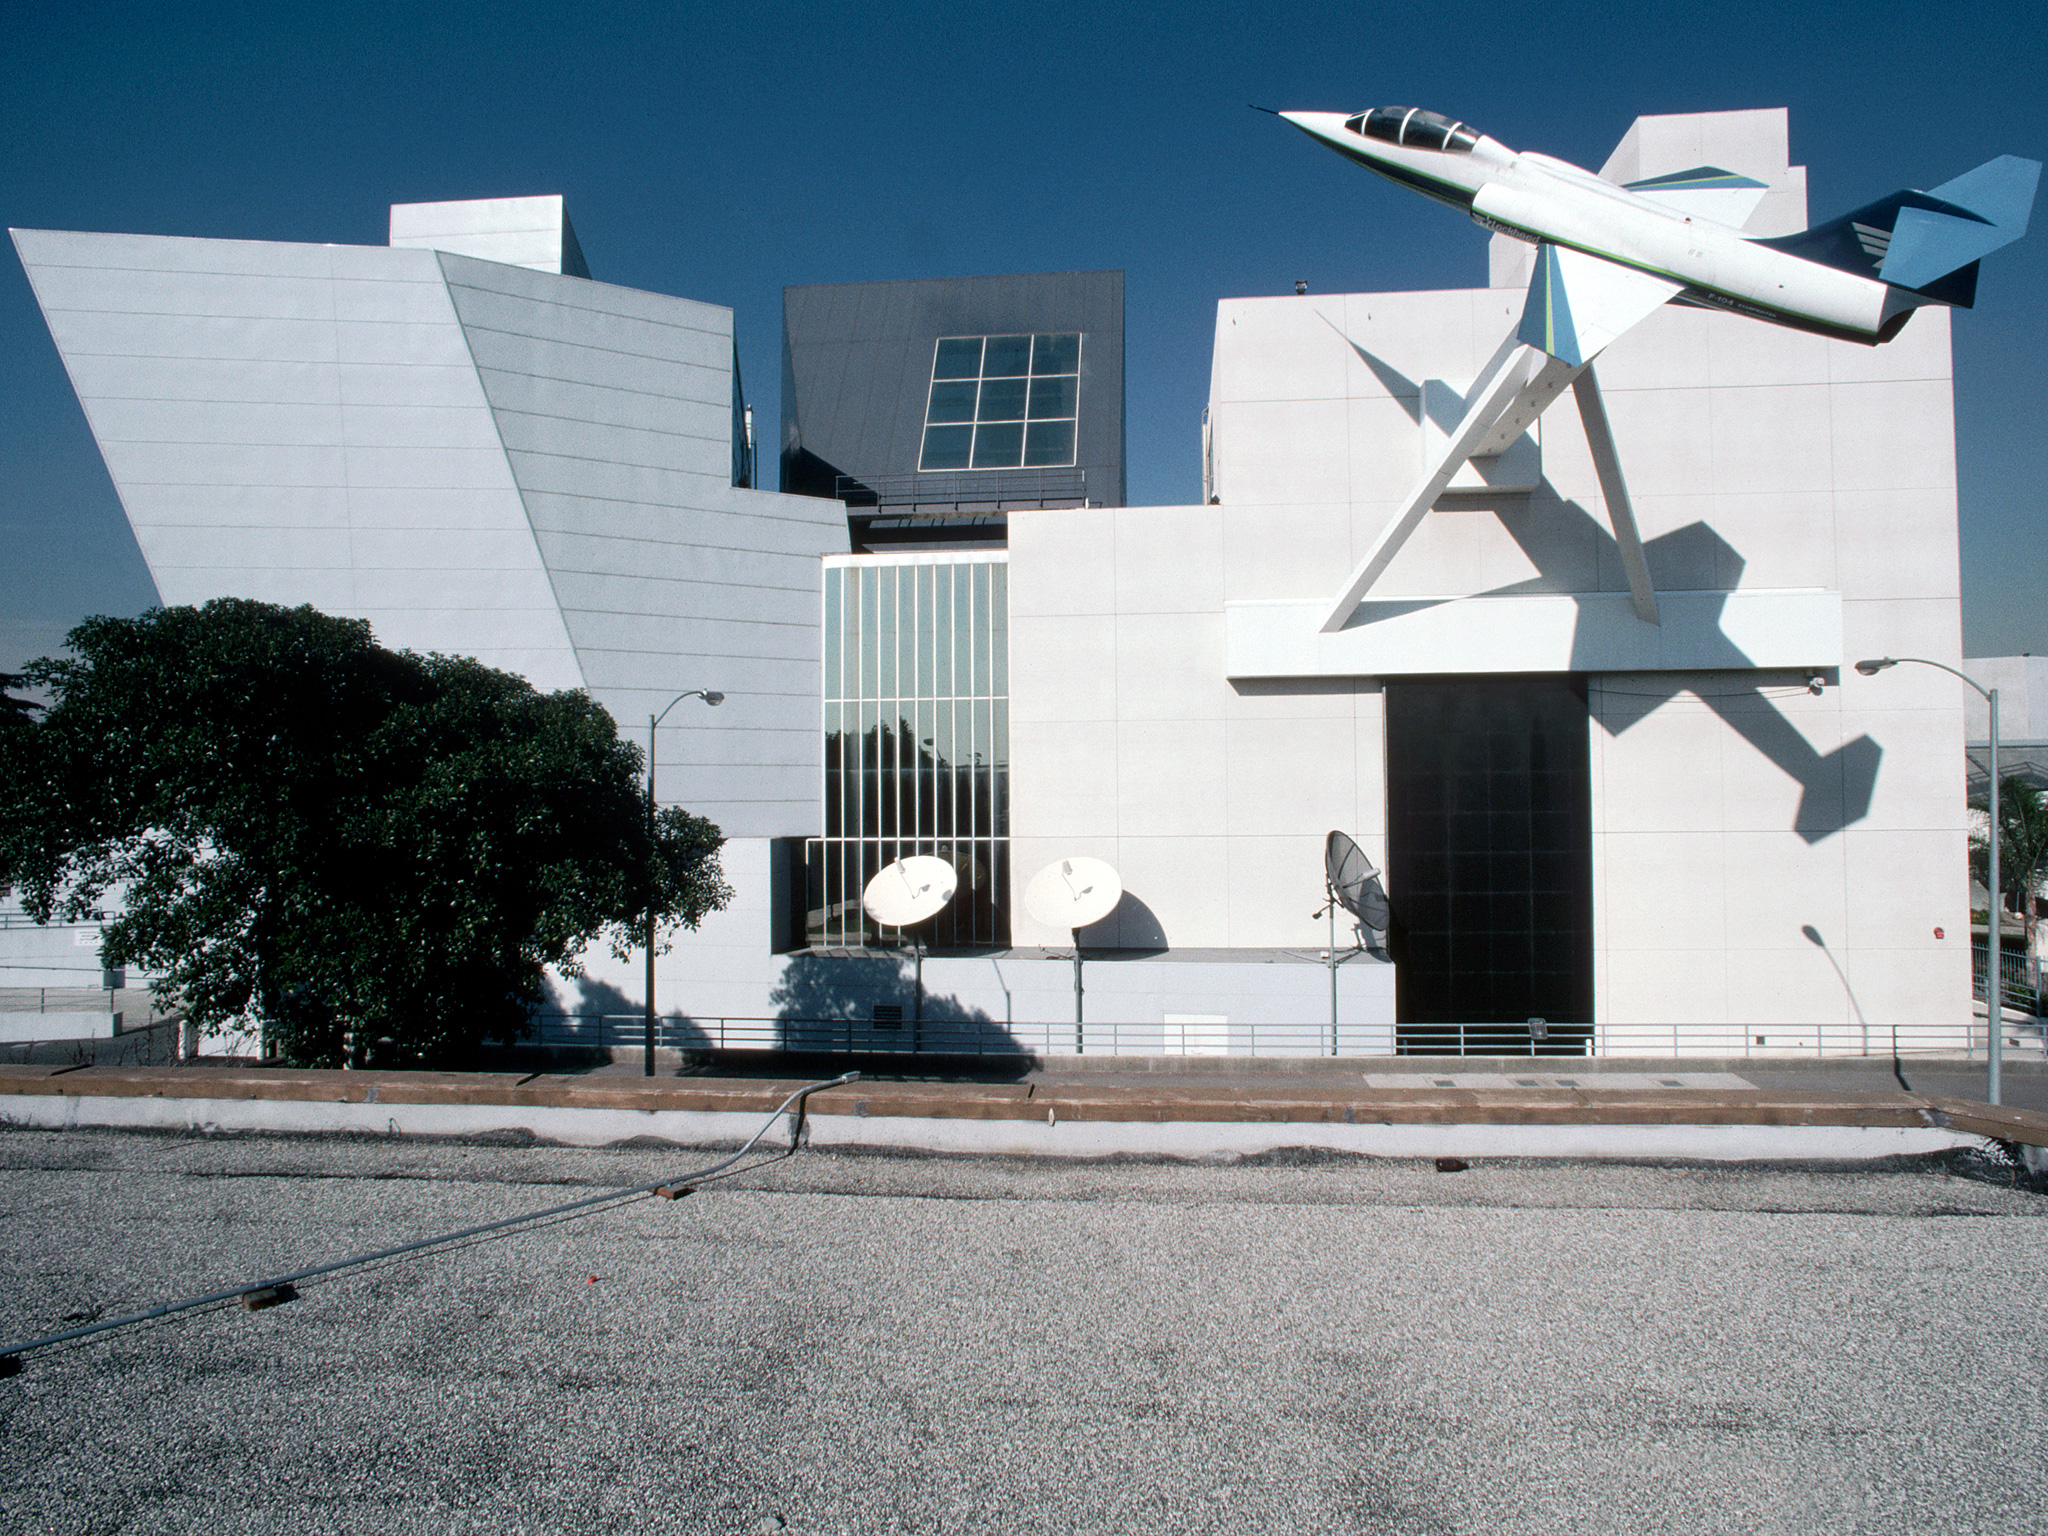 55fae168f6c571a371809bf9_frank-gehry-California-Aerospace-Museum-cr-corbis.jpg